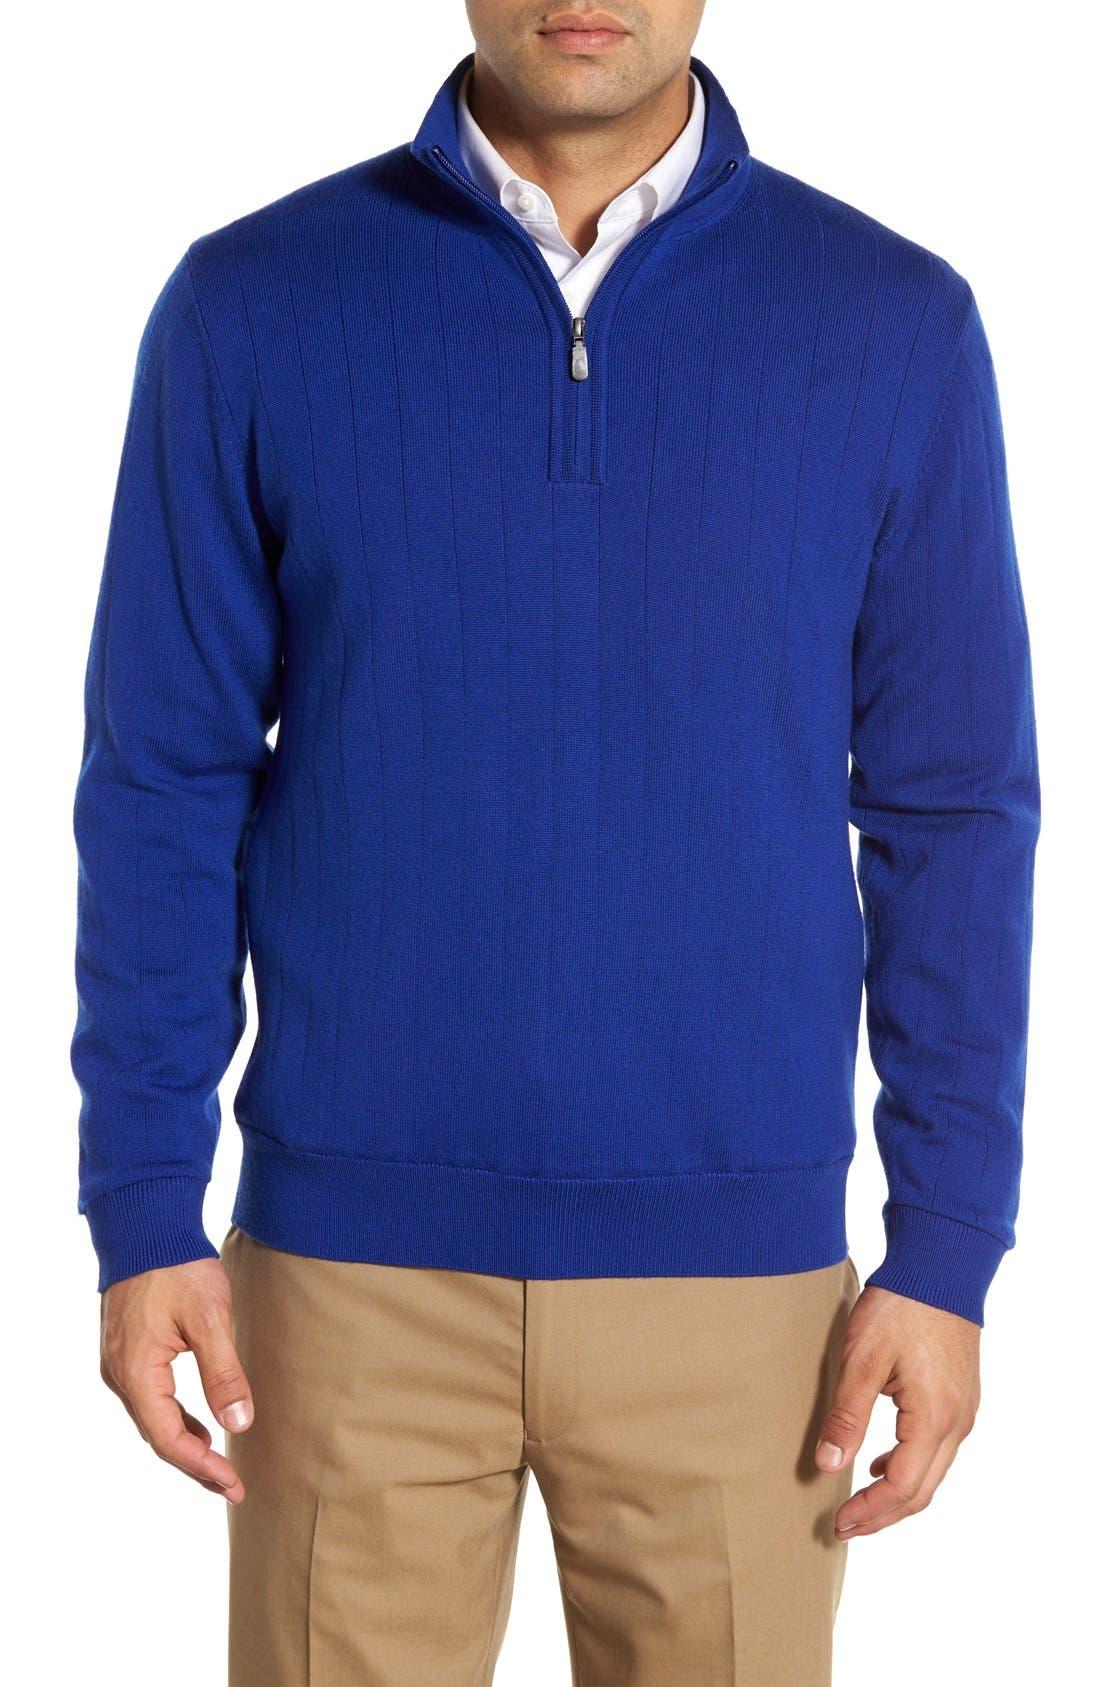 Alternate Image 1 Selected - Bobby Jones Windproof Merino Wool Quarter Zip Sweater